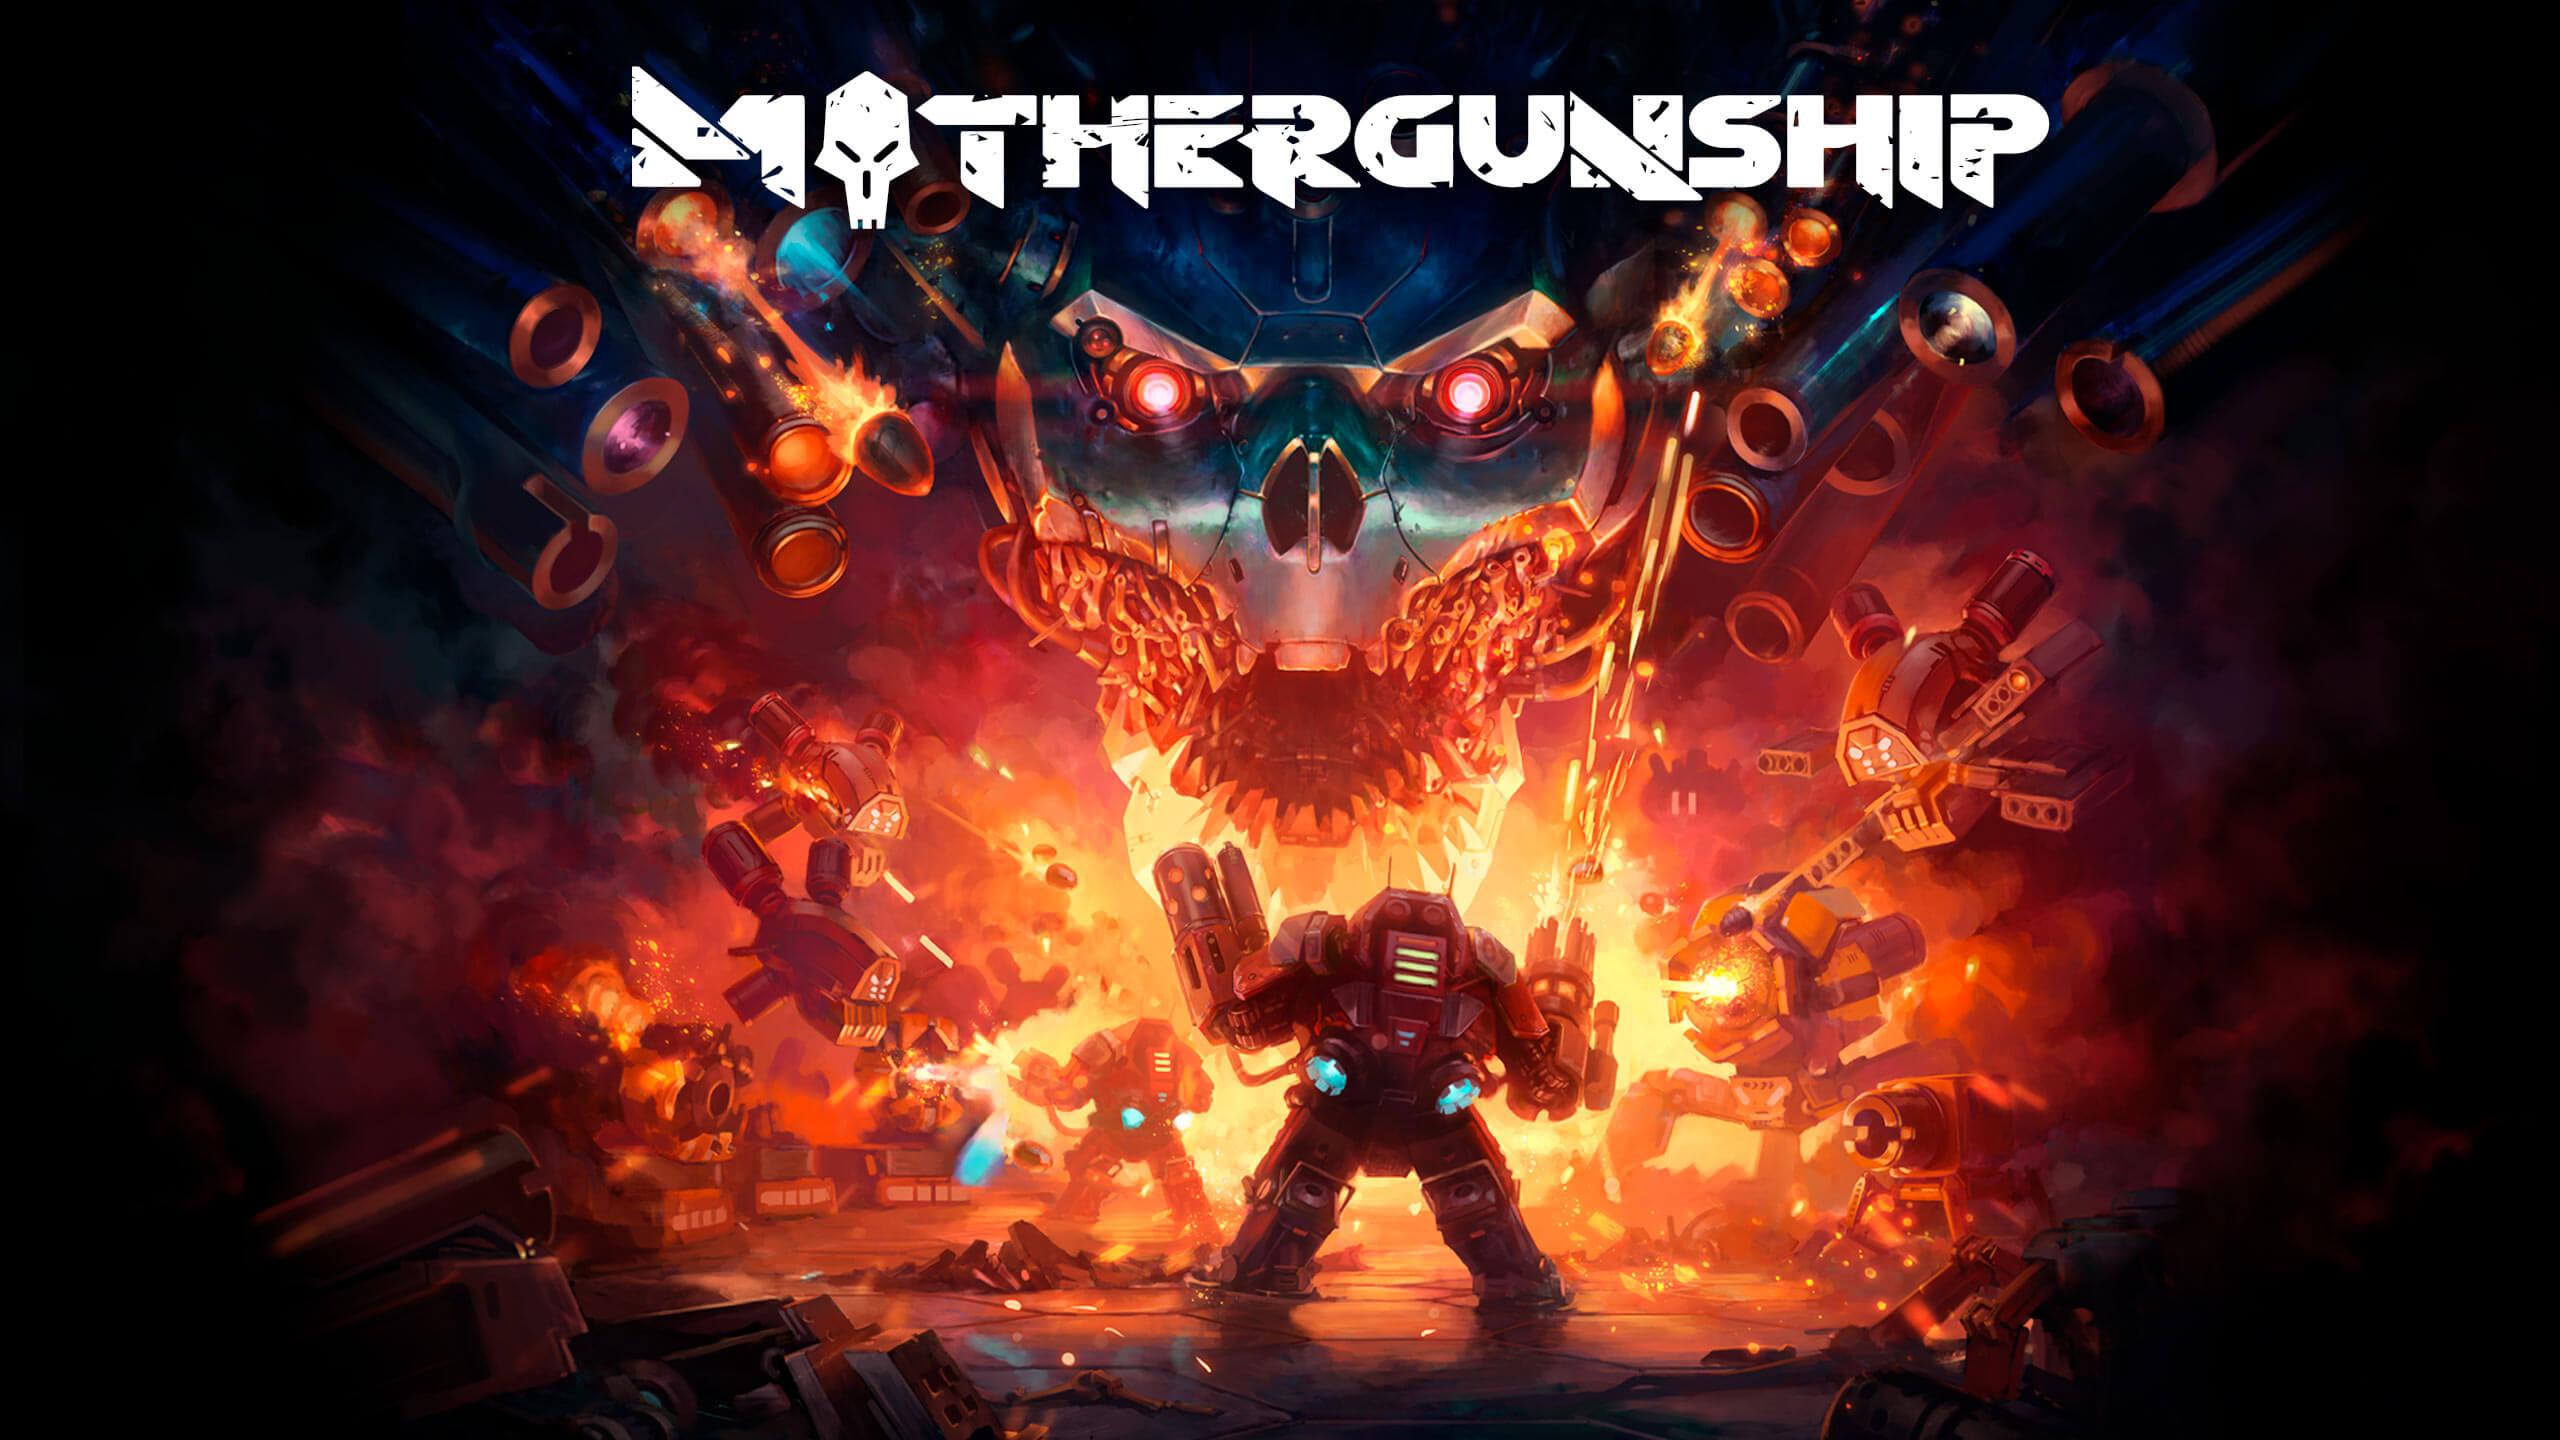 Mothergunship Thumbnail